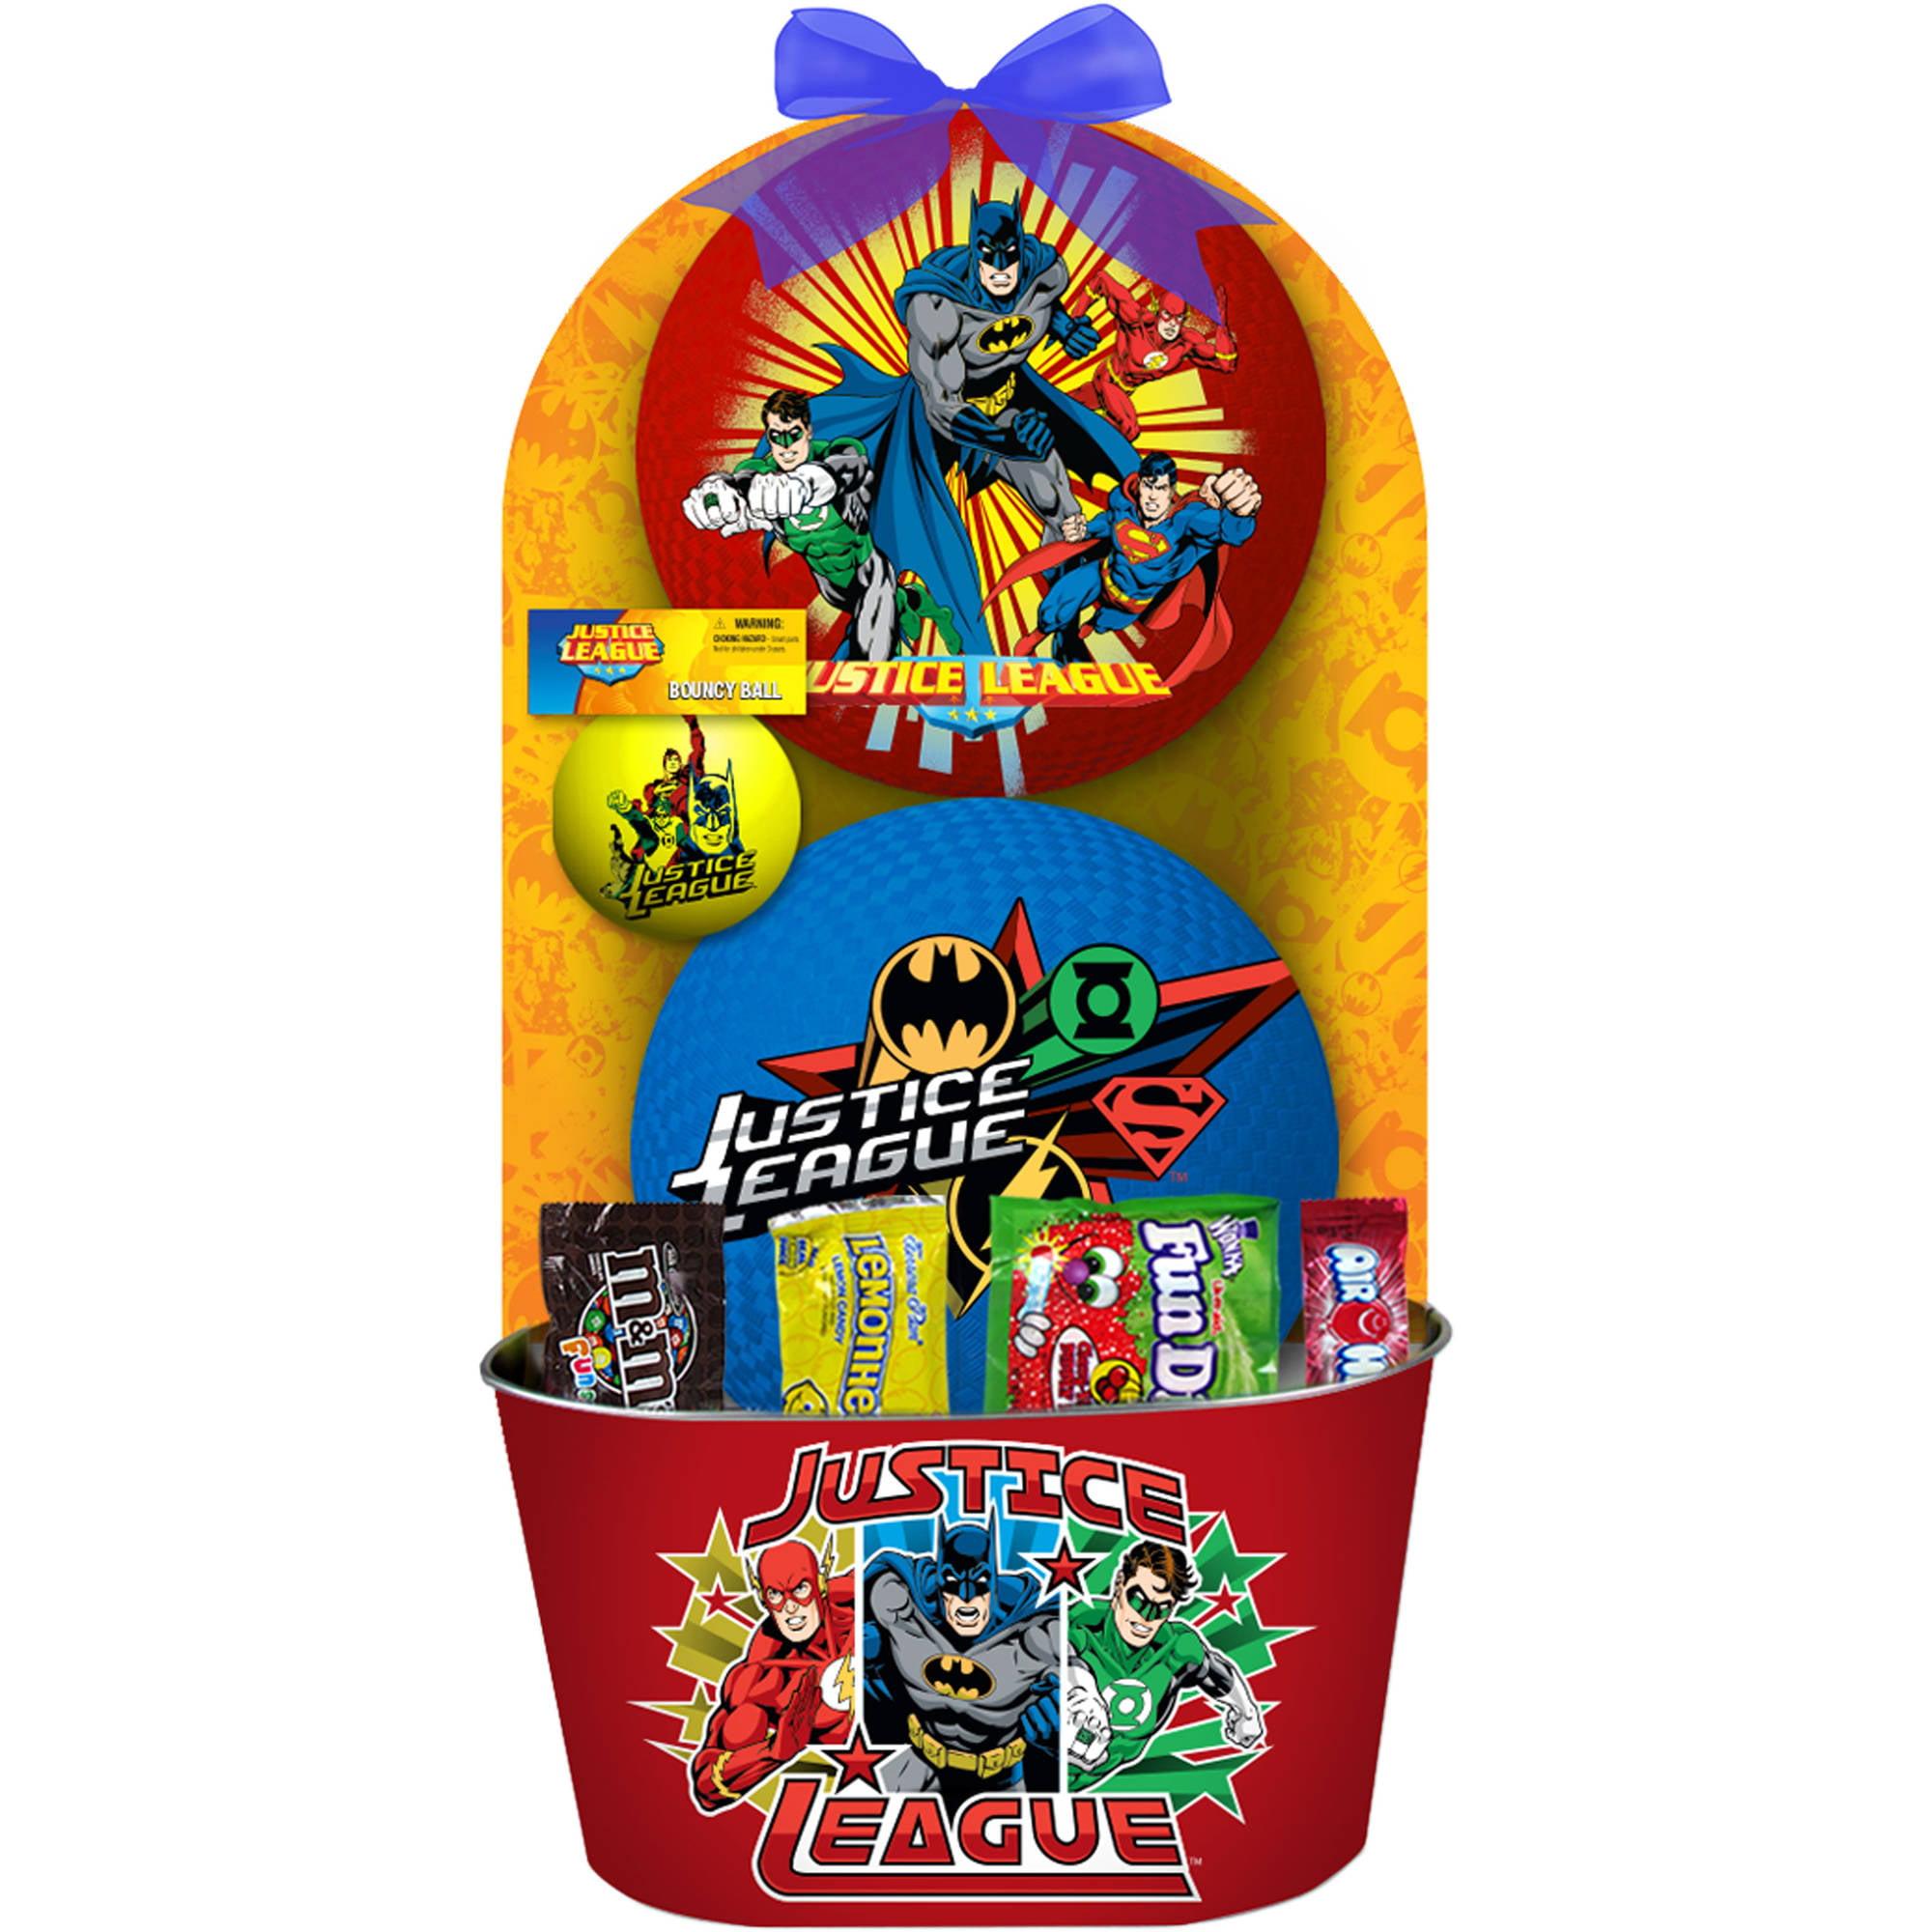 Justice League Easter BasketPc